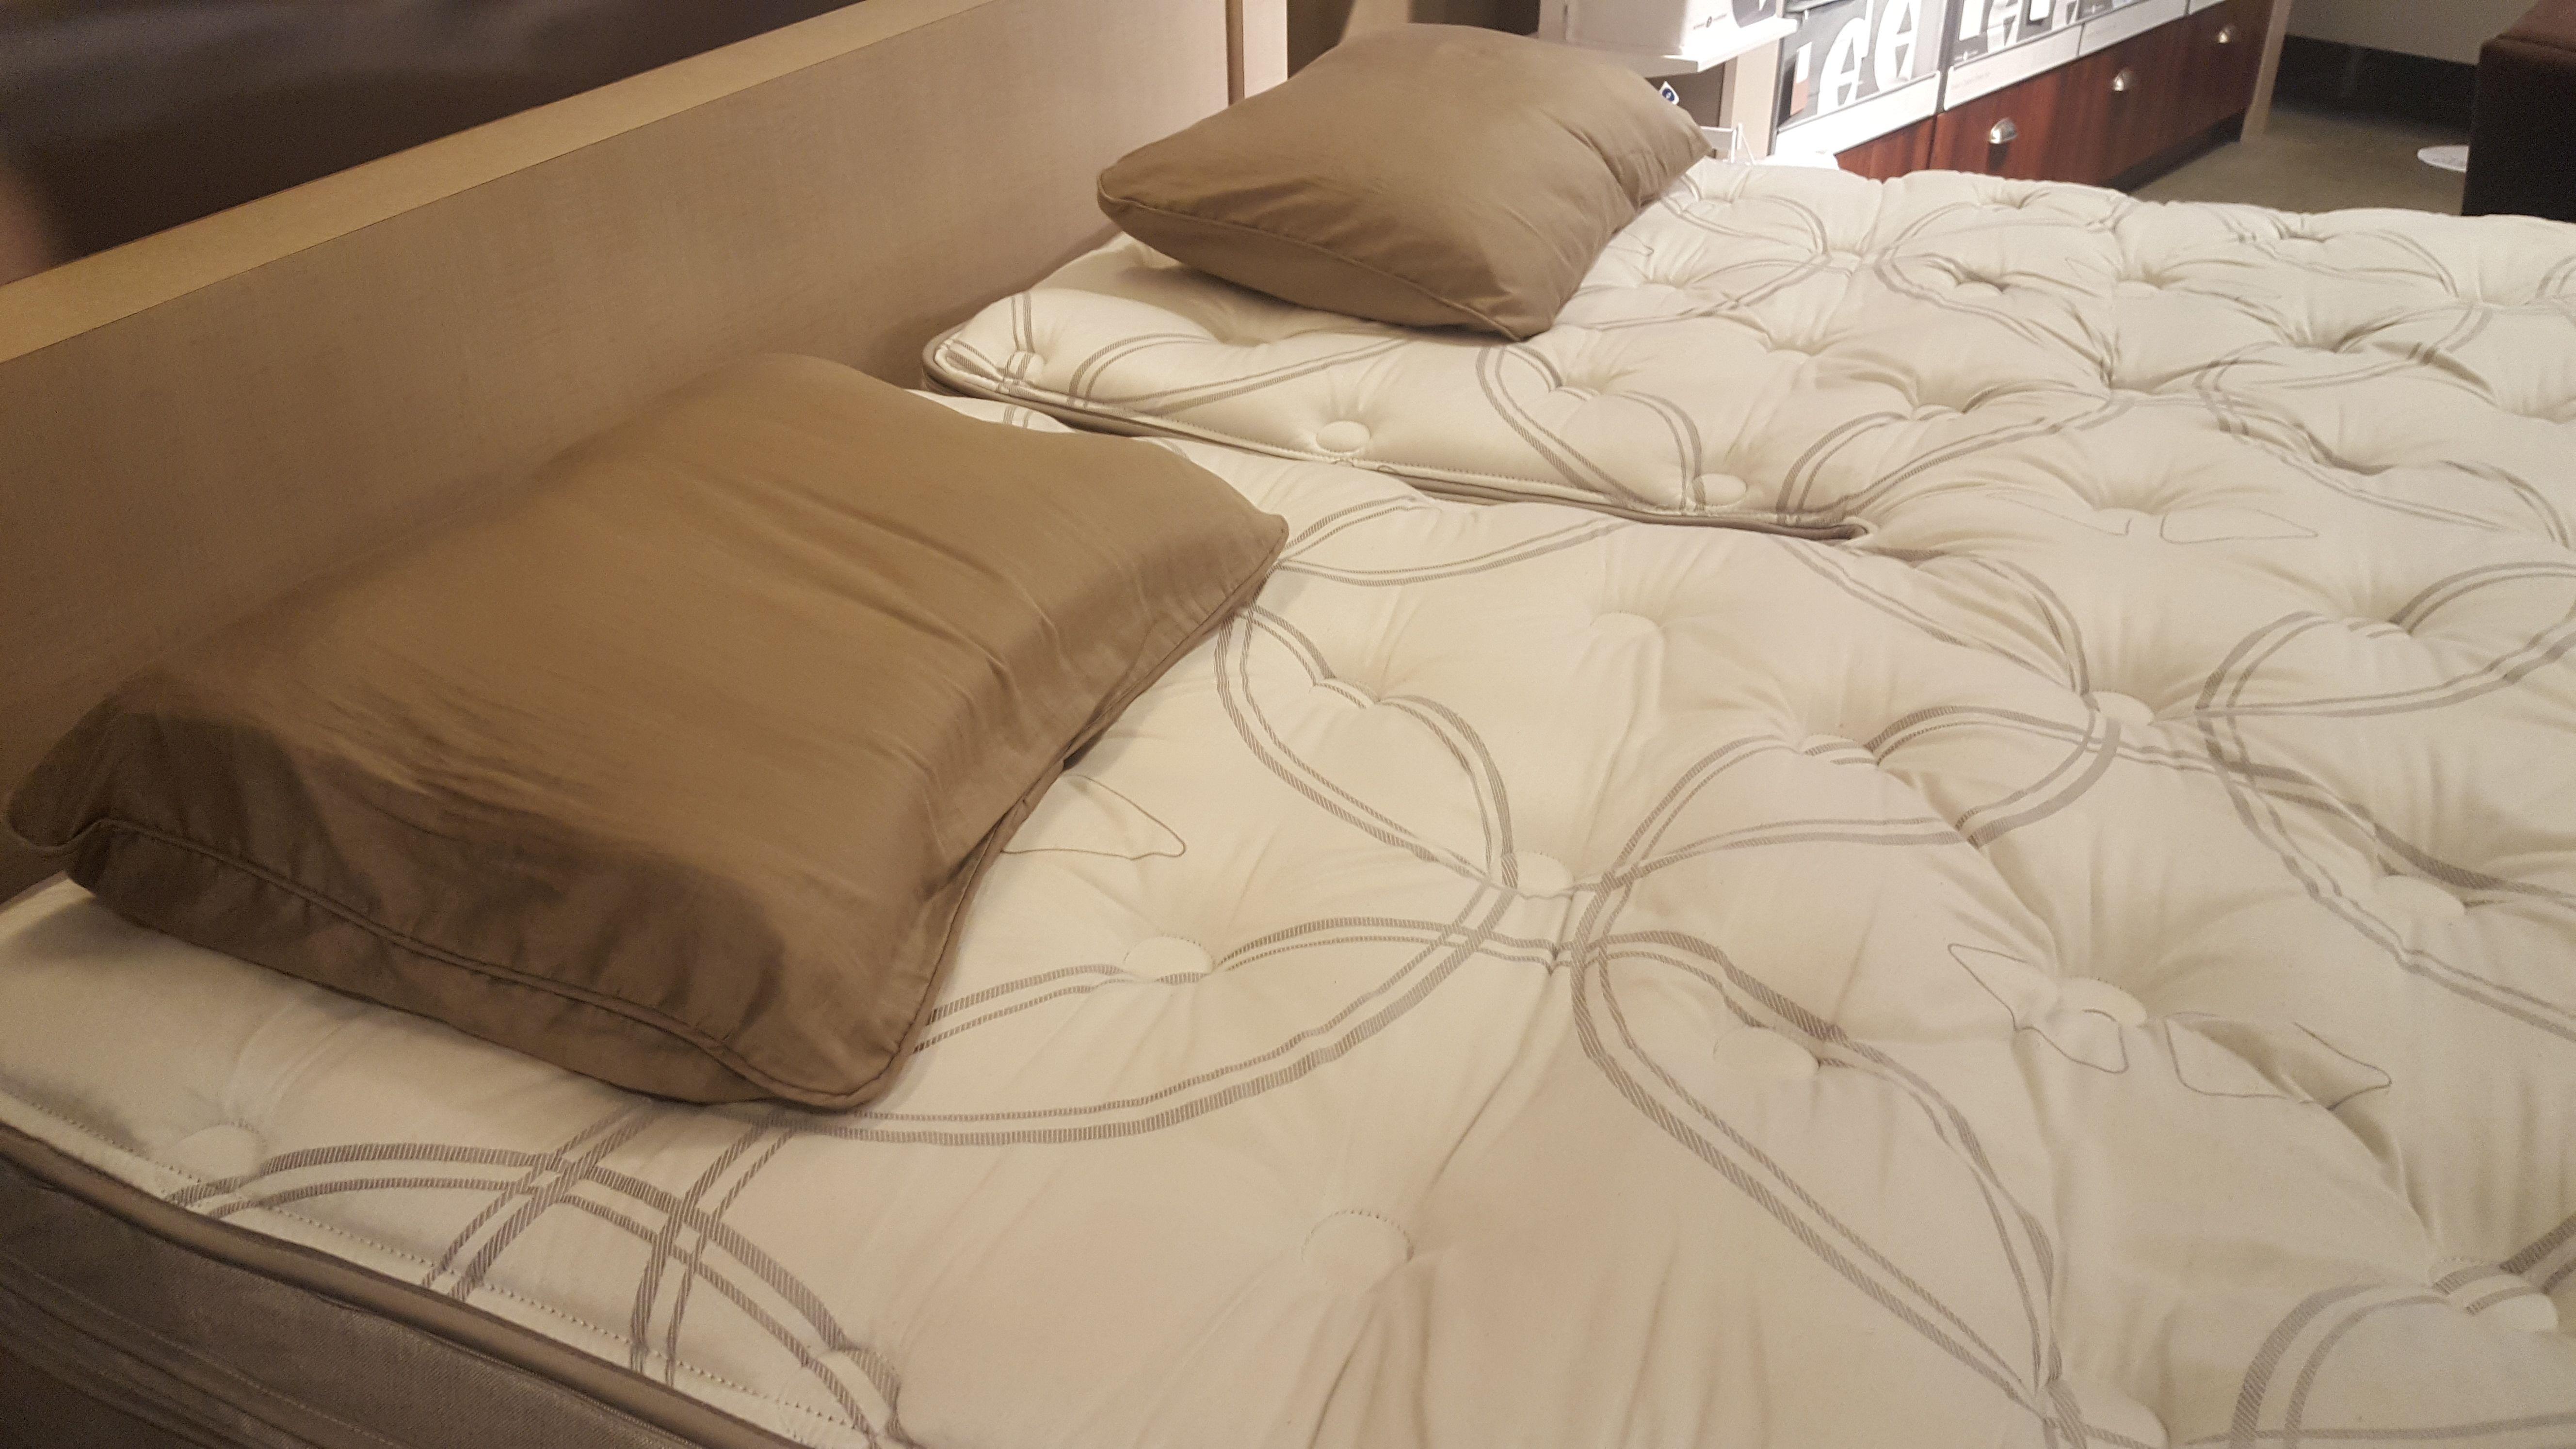 I8 mattress with Sleep IQ technology at Sleep Number store